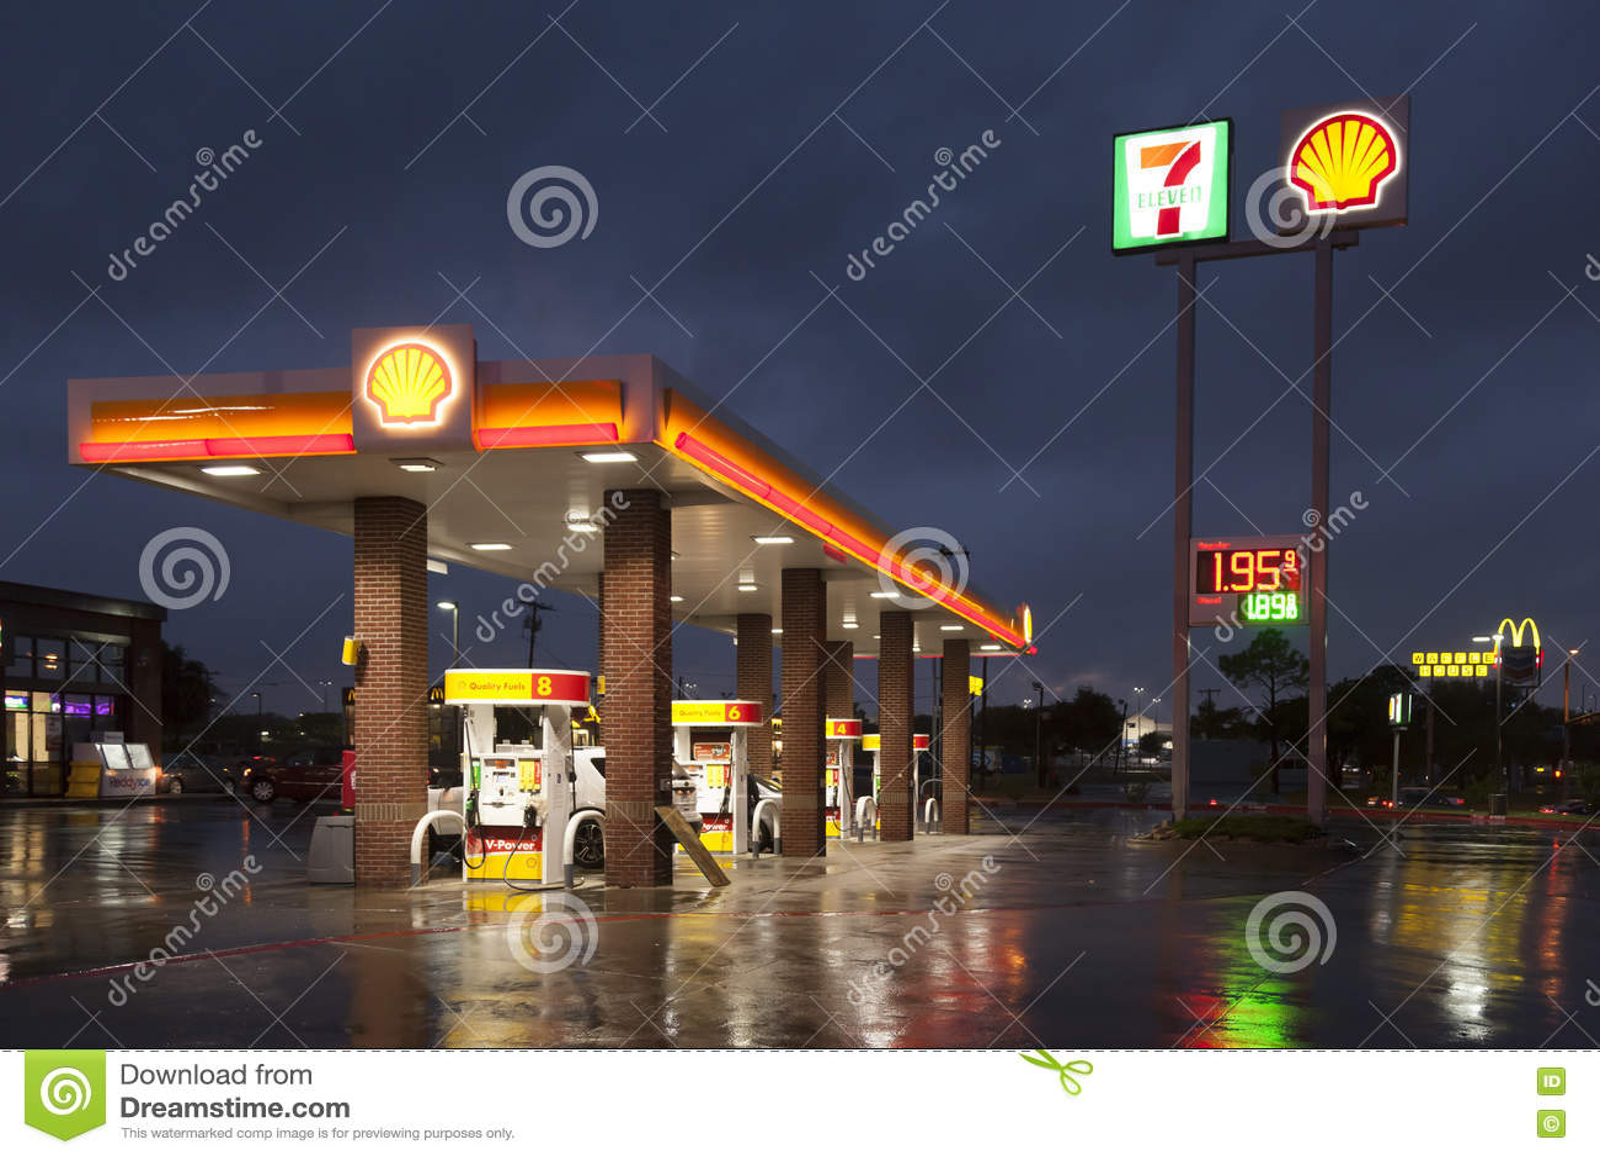 Shell Gas Station at night